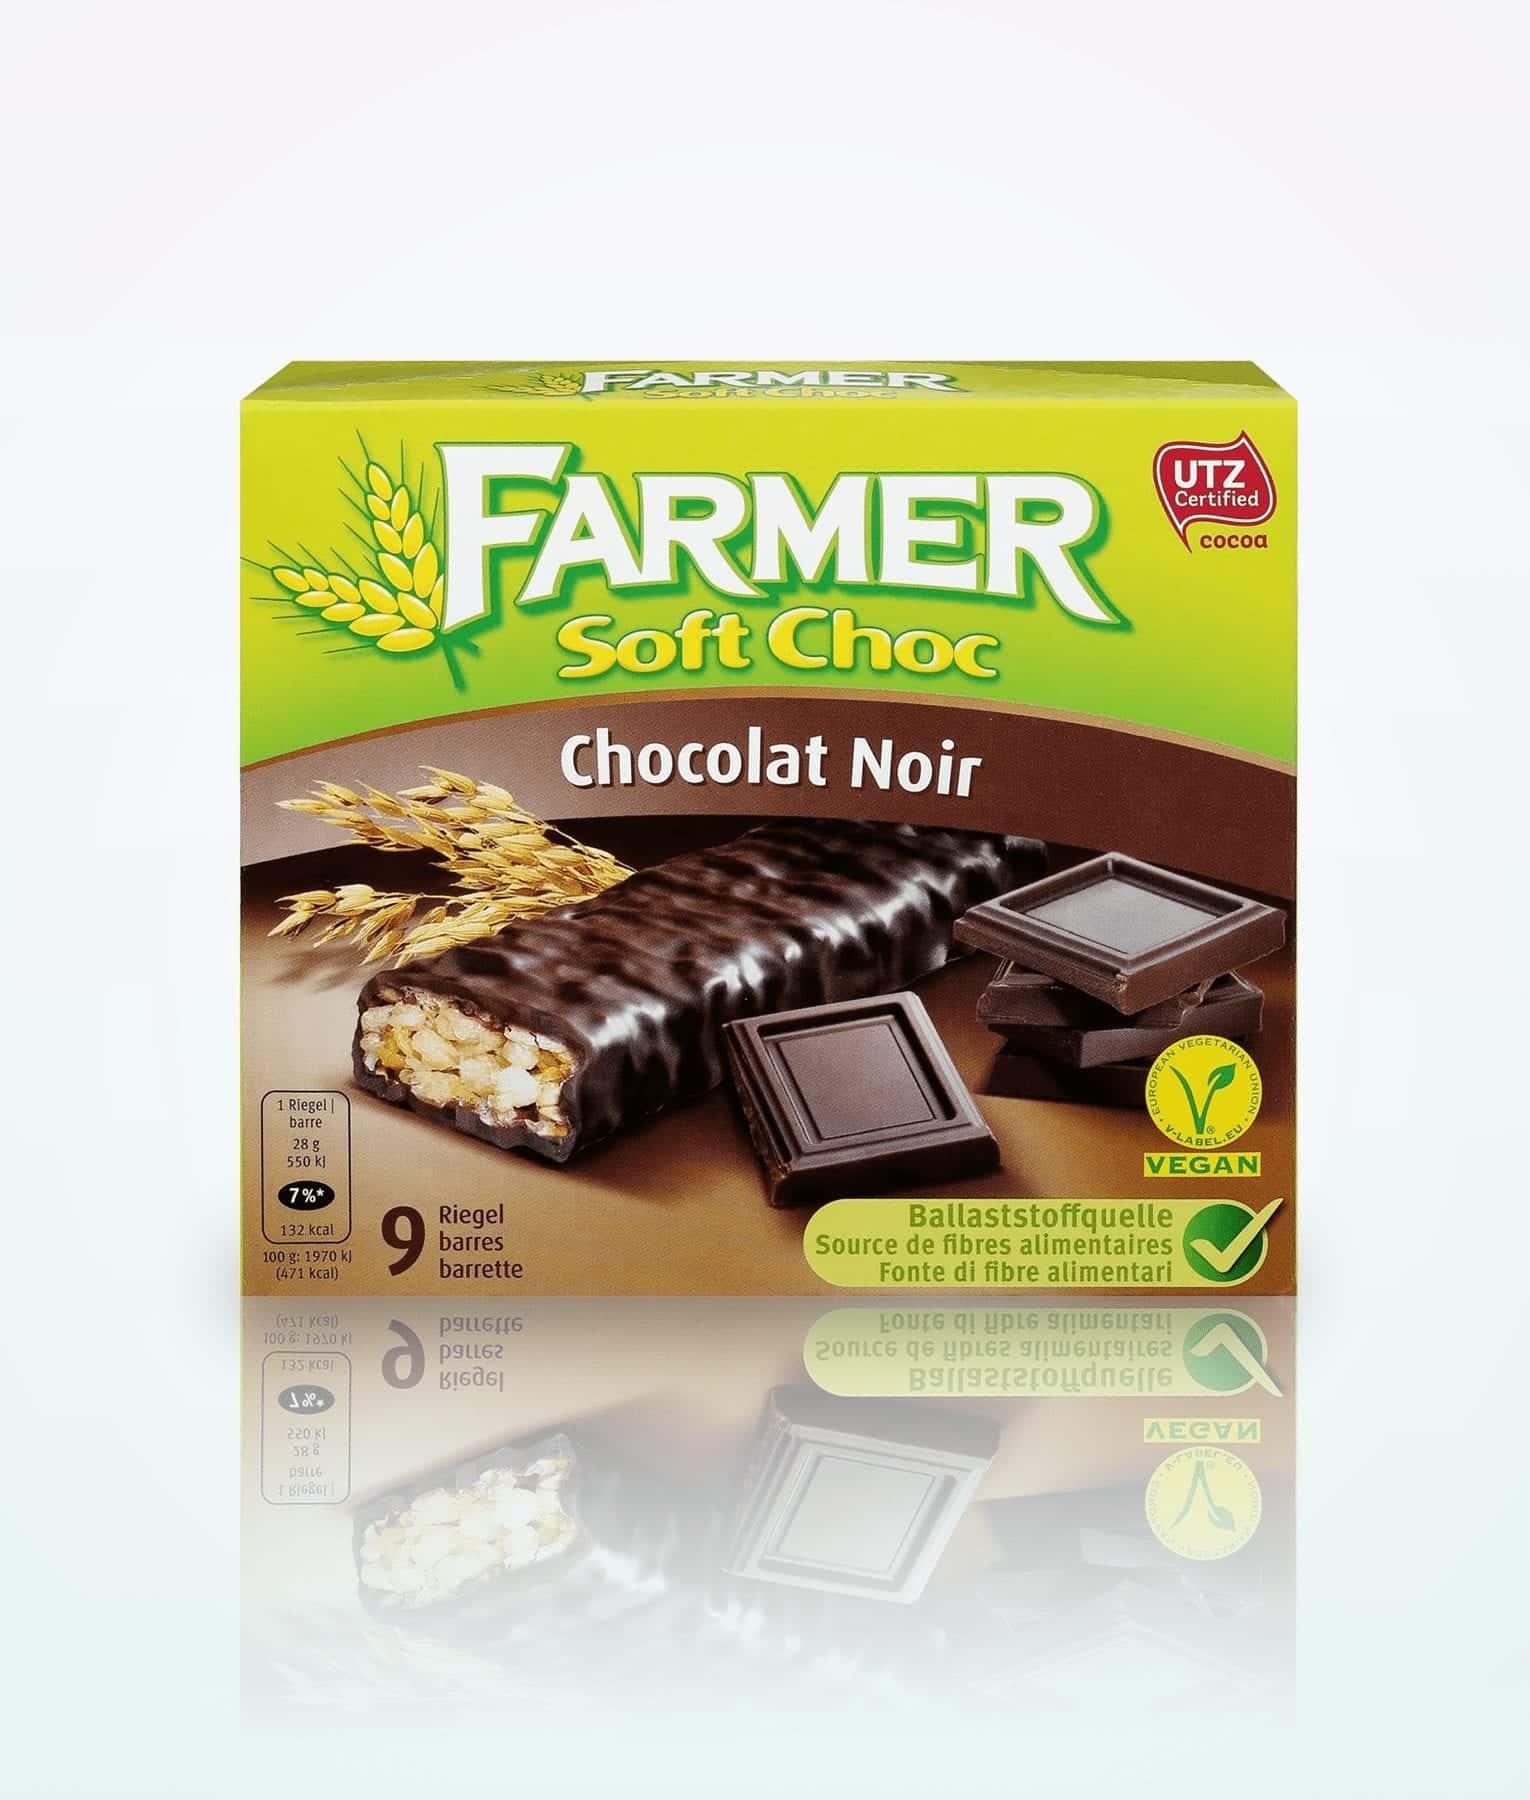 farmer-9-soft-choc-natural